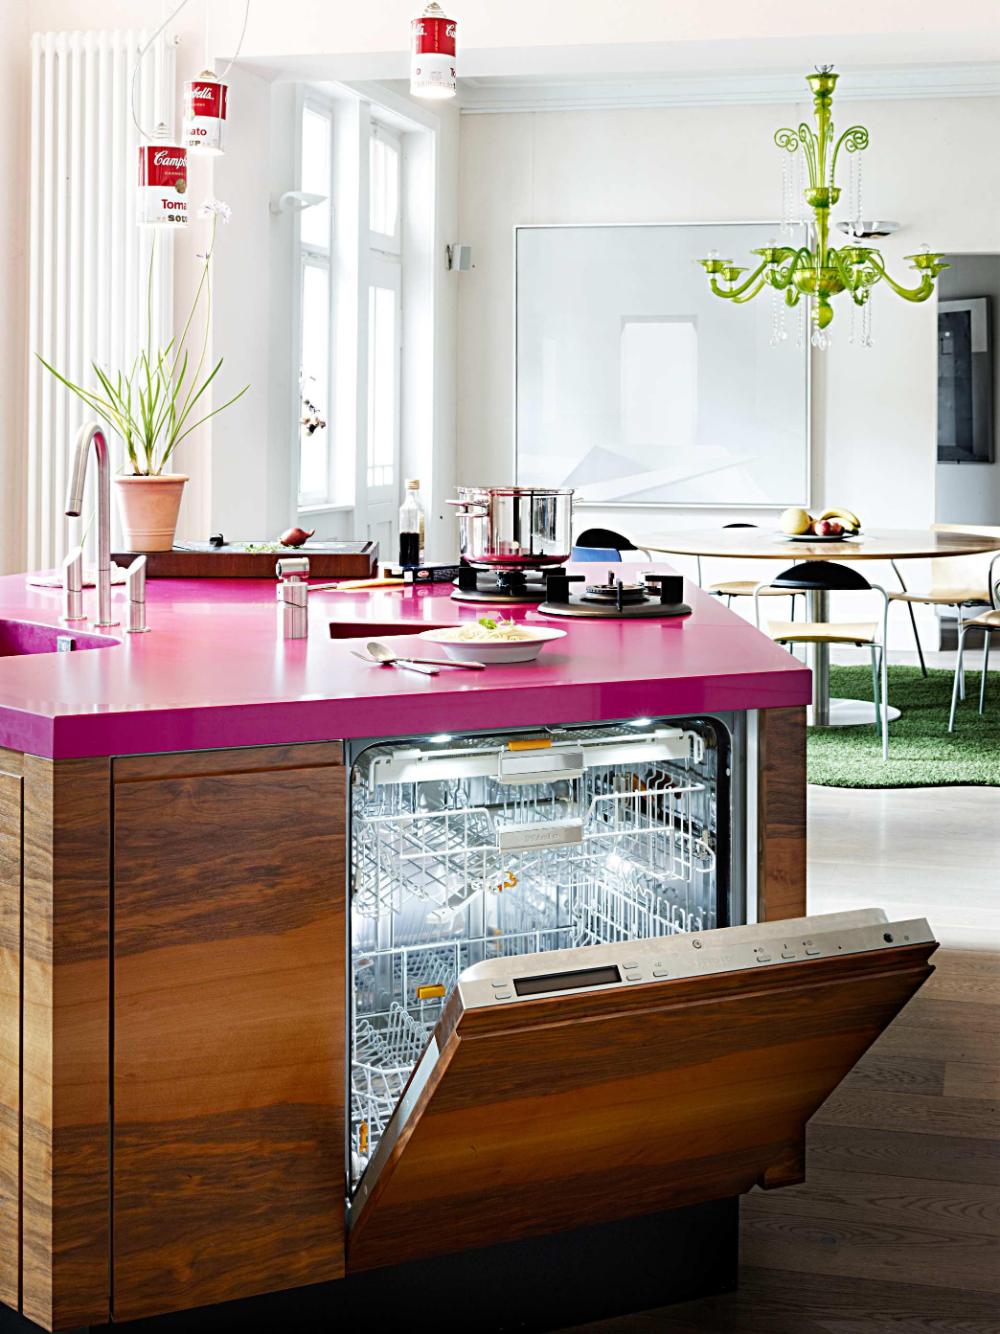 Kitchen KI 1 - High quality designer products | Architonic ...